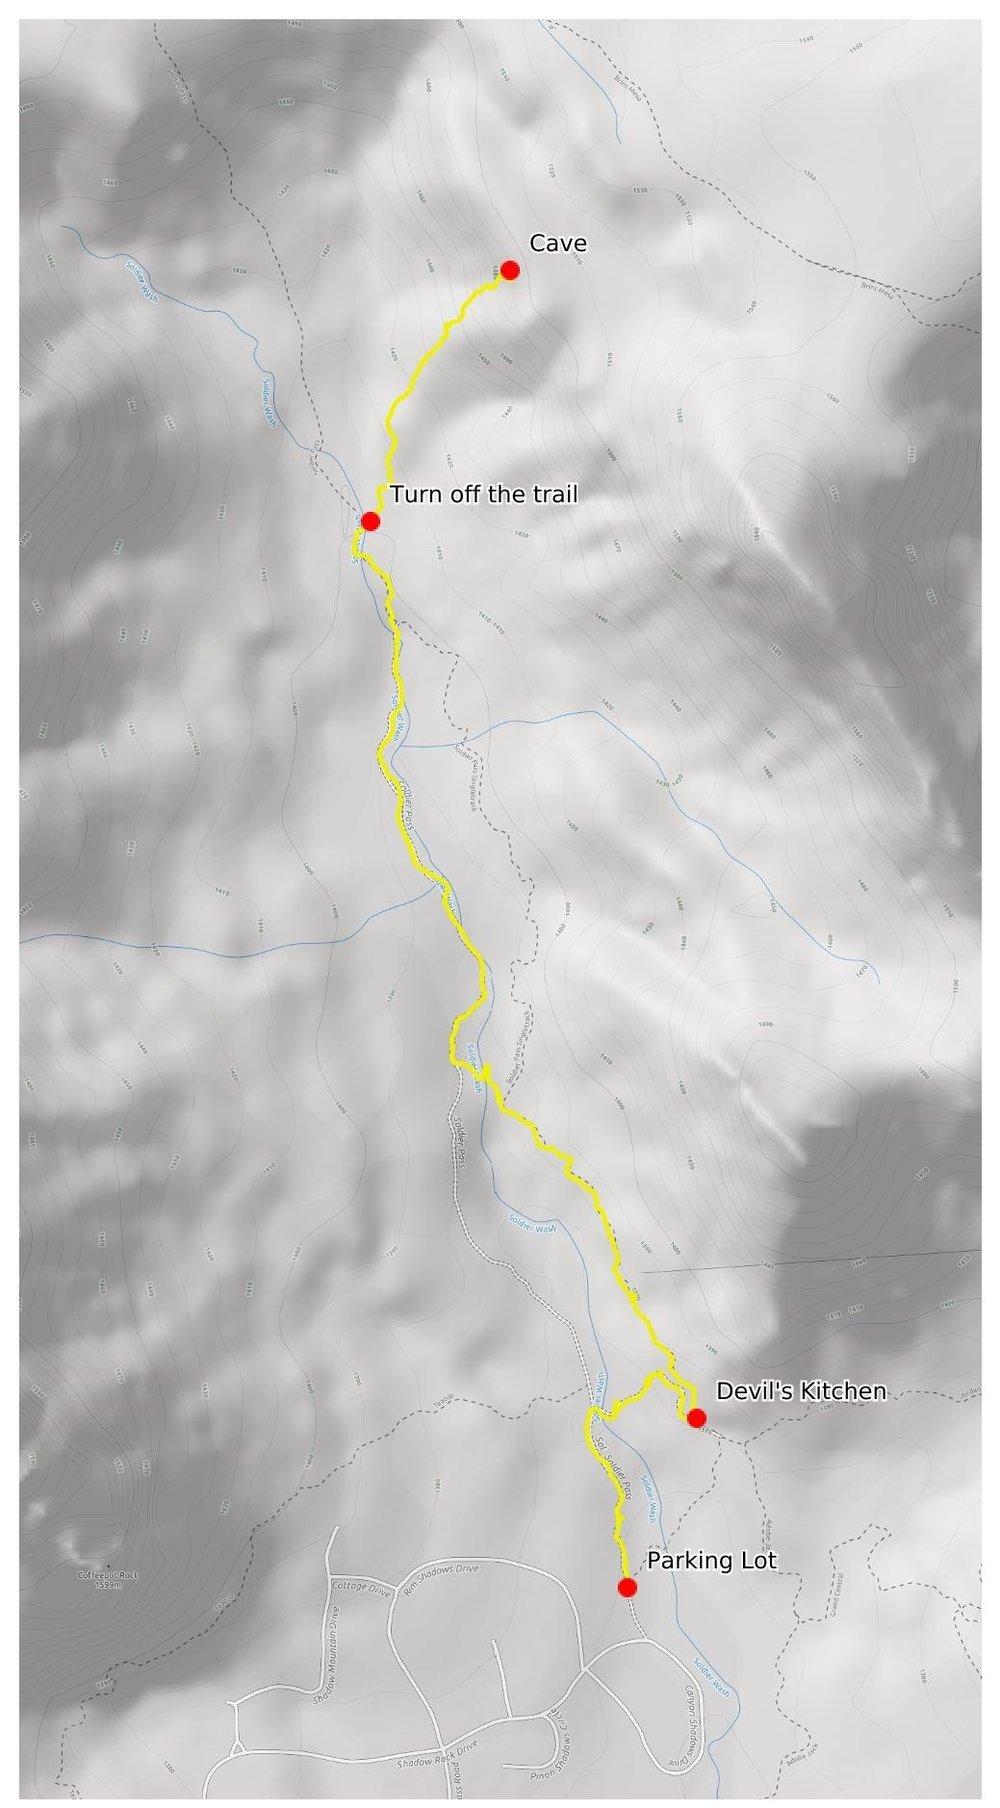 sedona-soldier-pass-cave-trail-map.jpeg